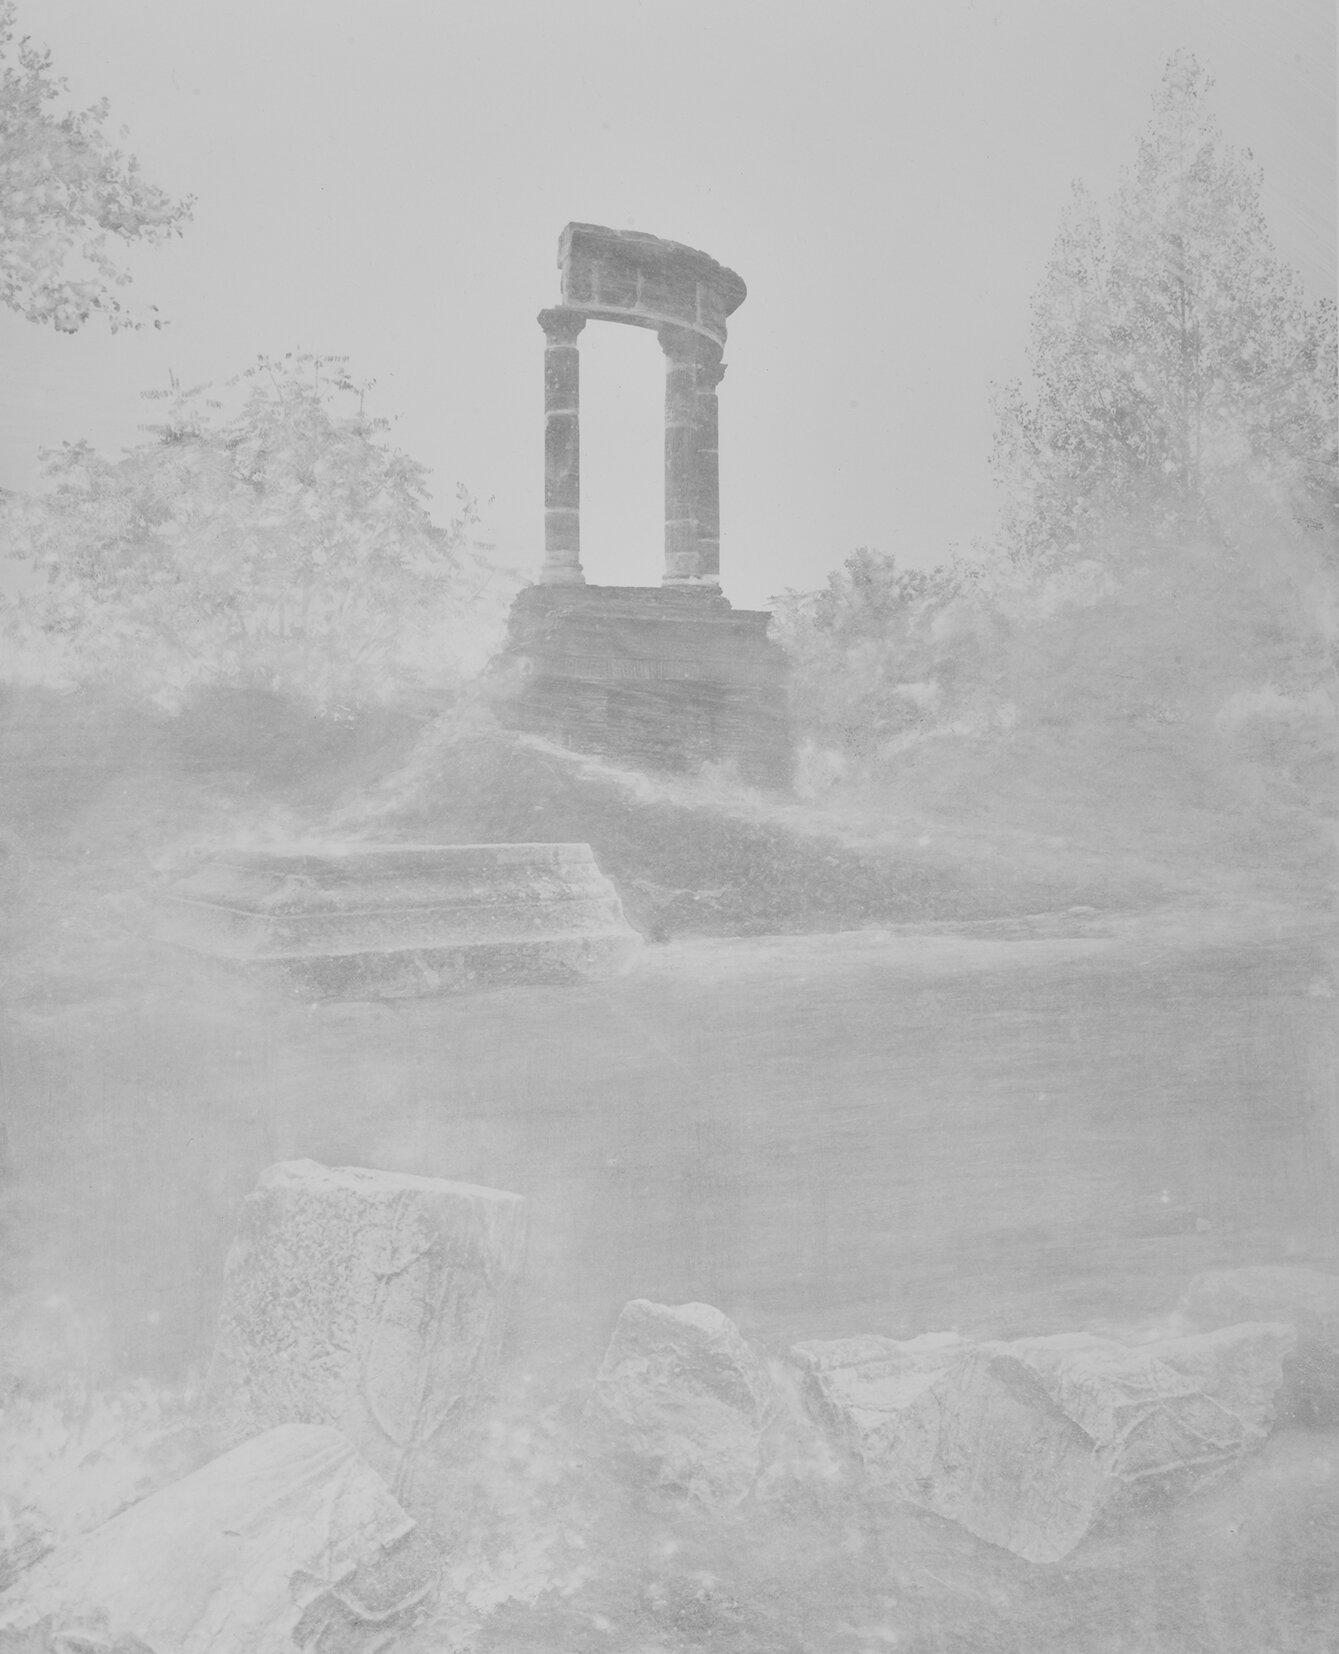 Pompeii_TombofGensIstacida_courtesyGalerieThierryBigaignon.jpg